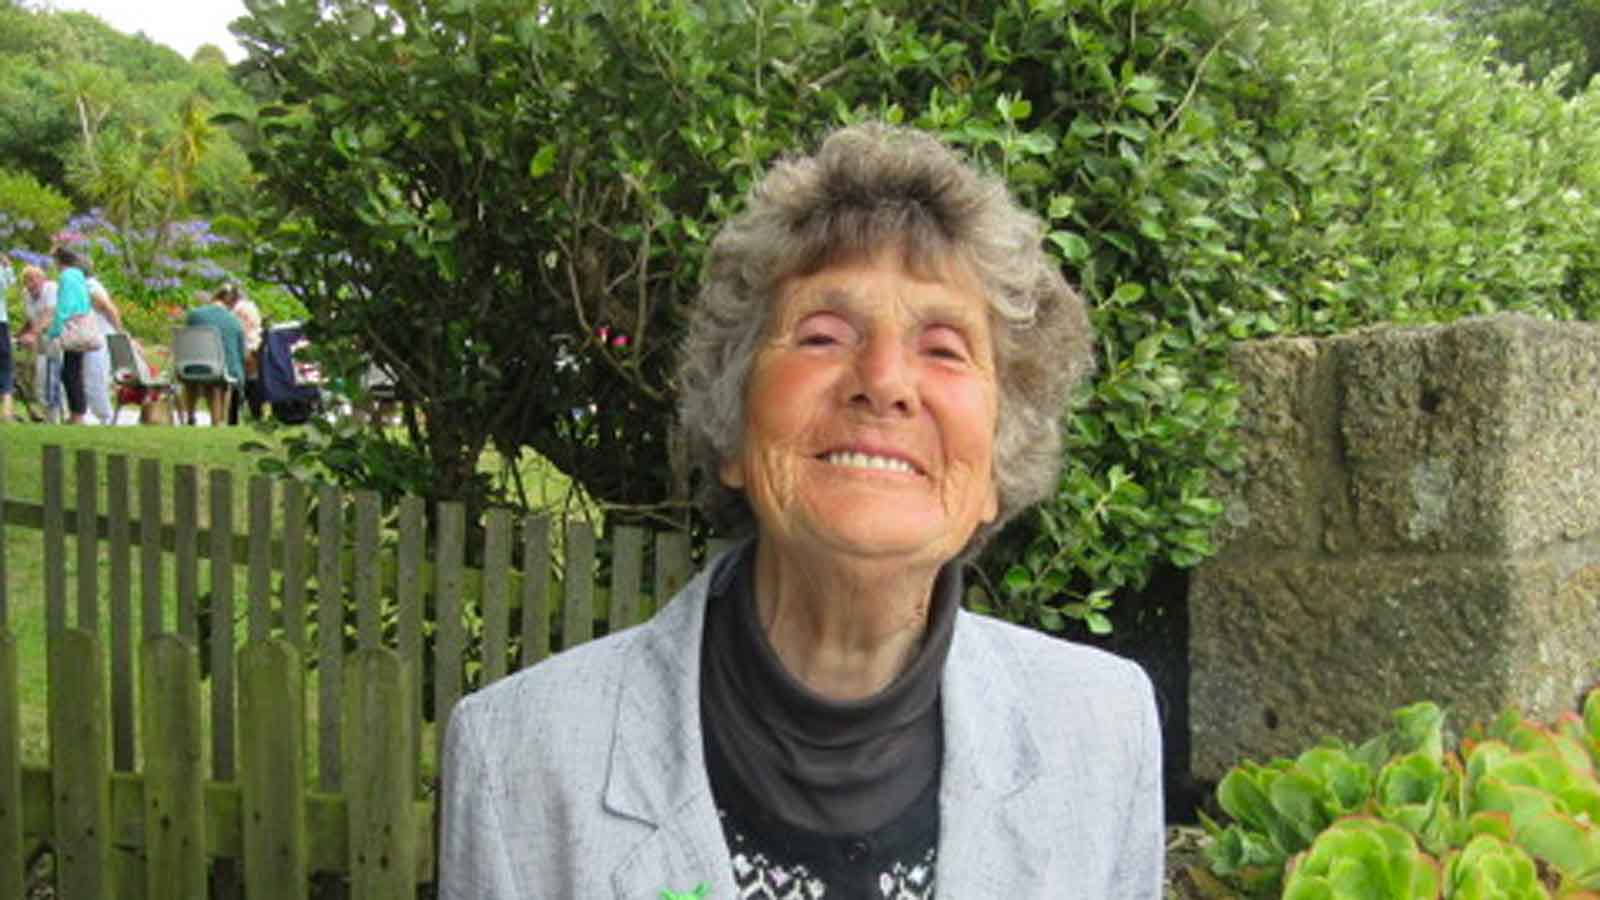 Islanders In Conversation - Maggie Perkovic